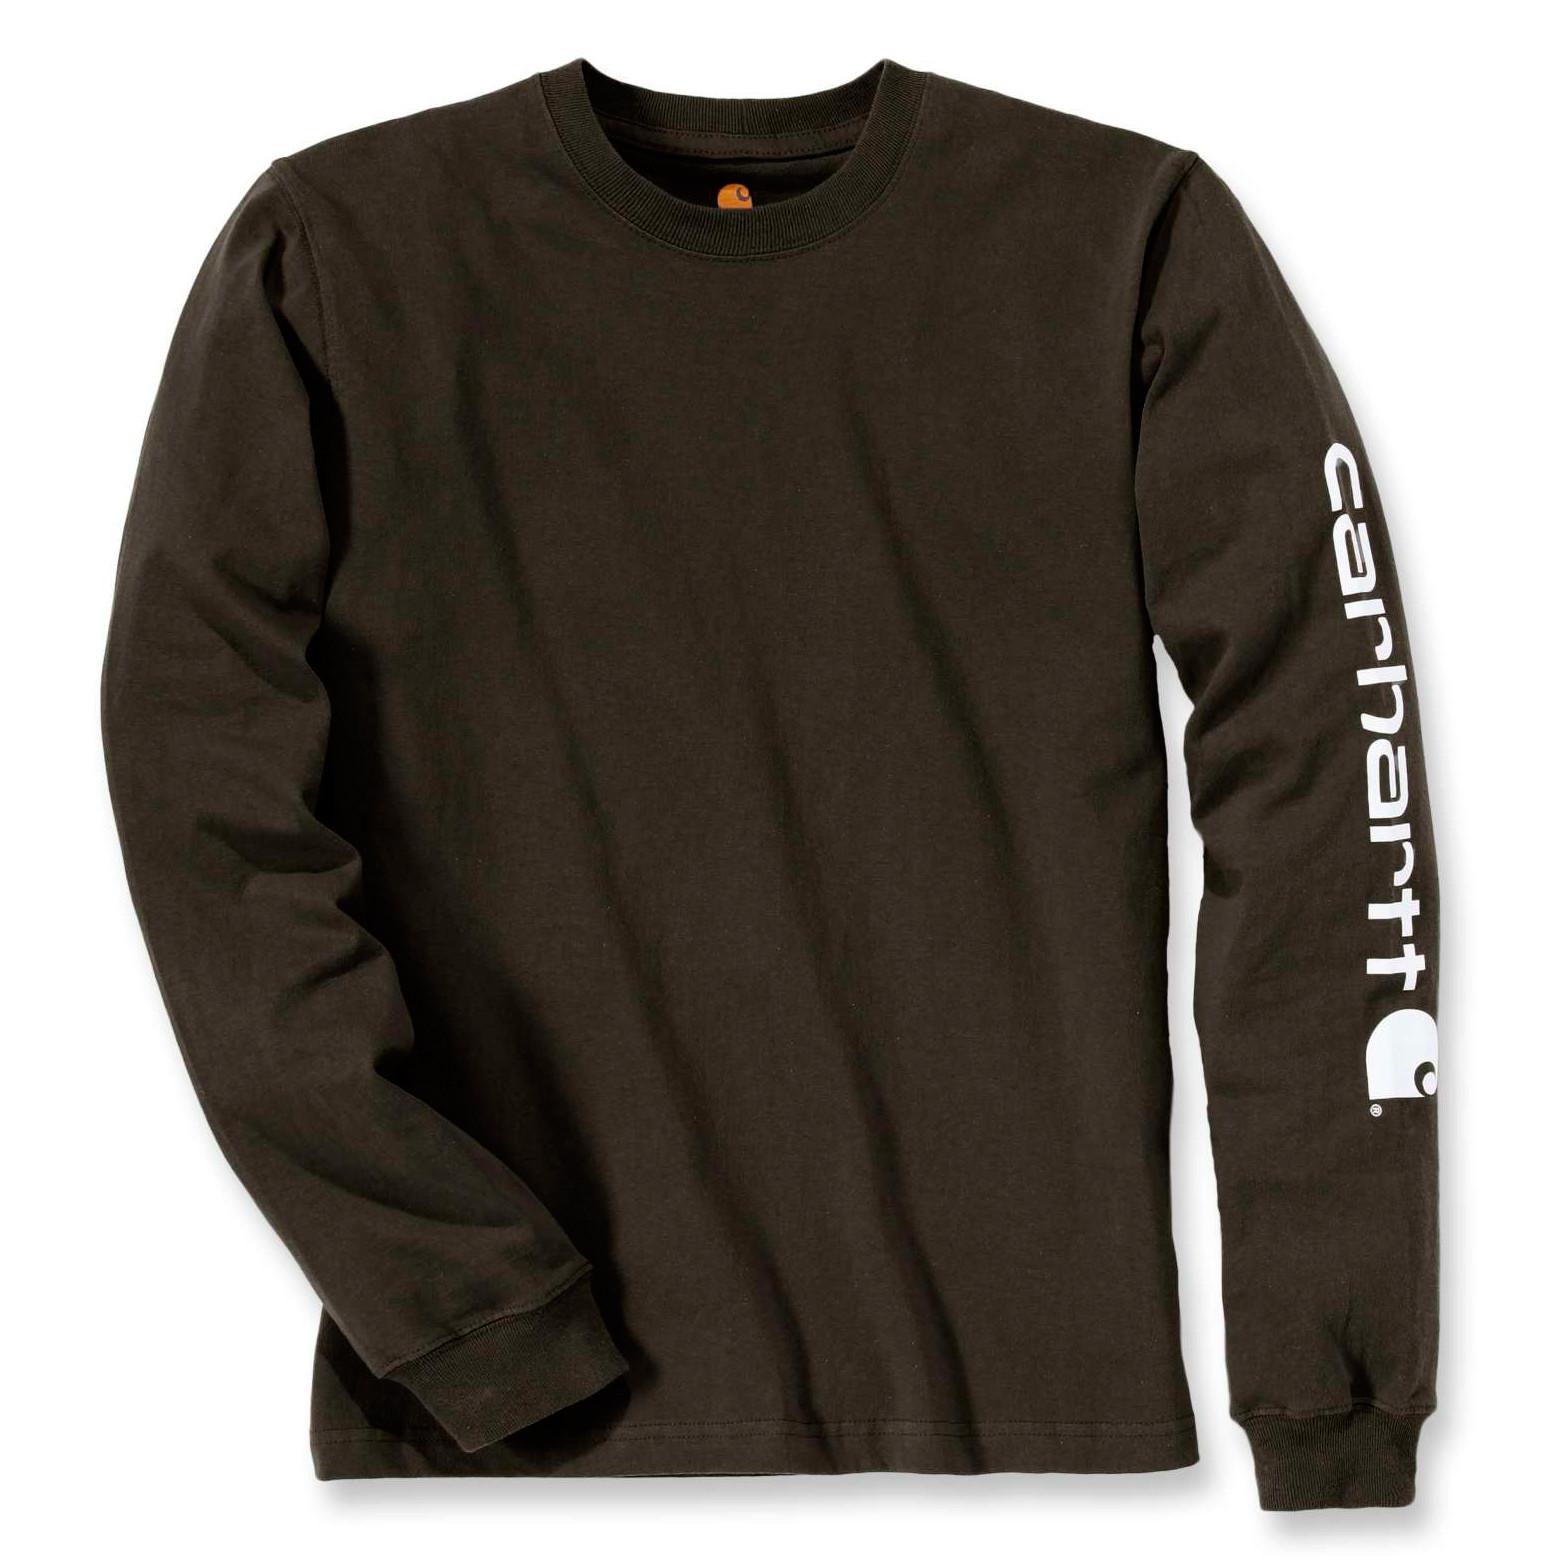 Футболка с длинным рукавом Carhartt Sleeve Logo T-Shirt L/S - EK231 (Peat, S)